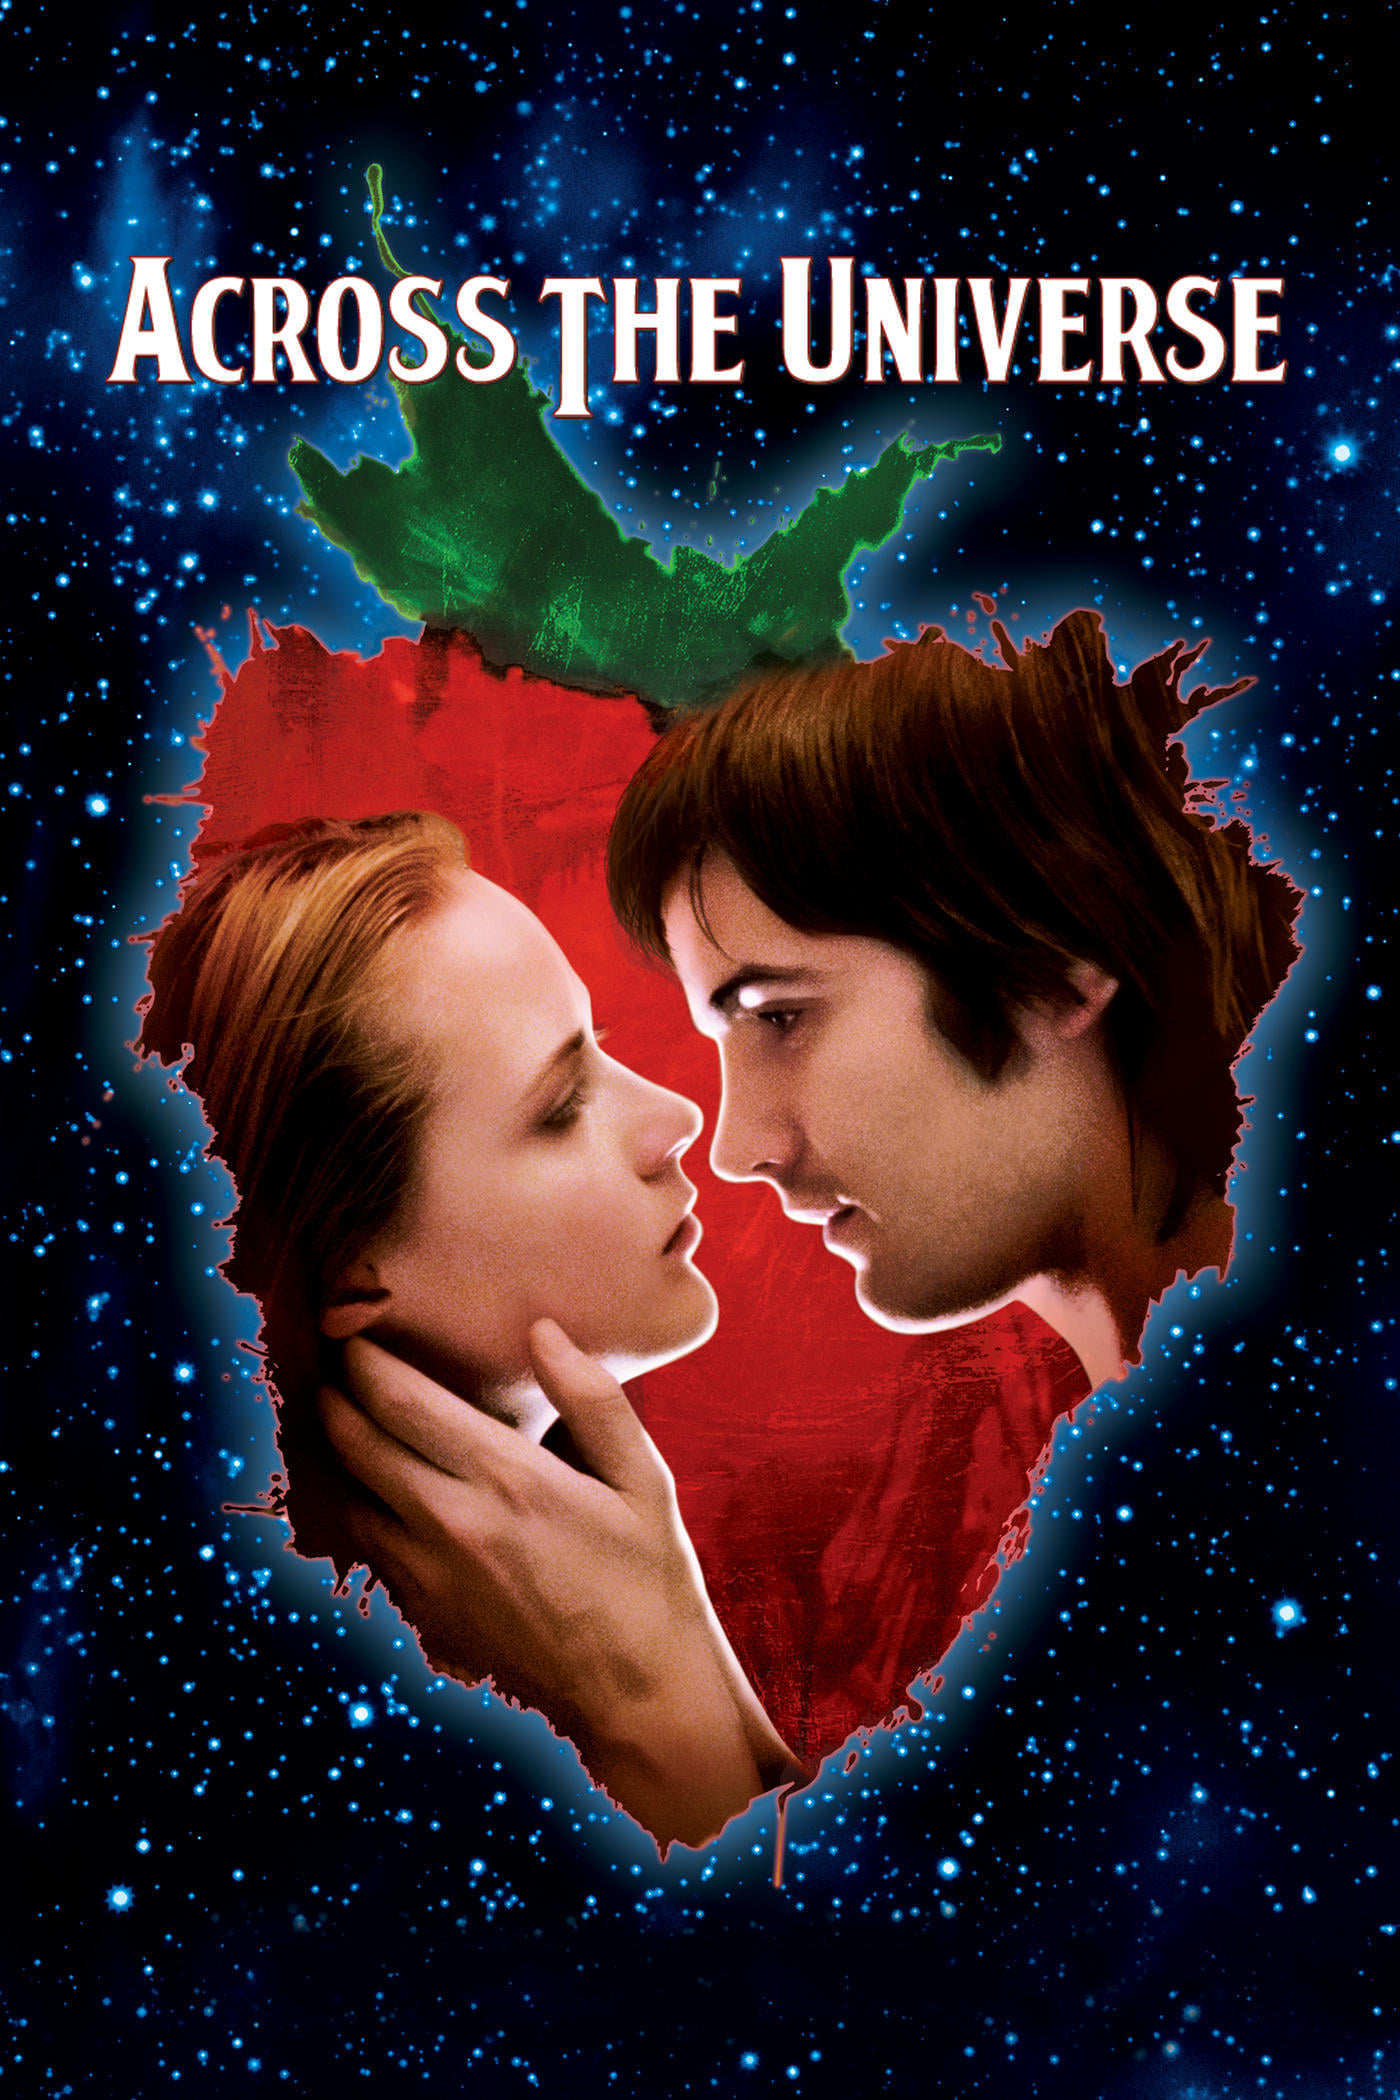 Across the Universe PELICULA COMPLETA en Repelis 【GRATIS】